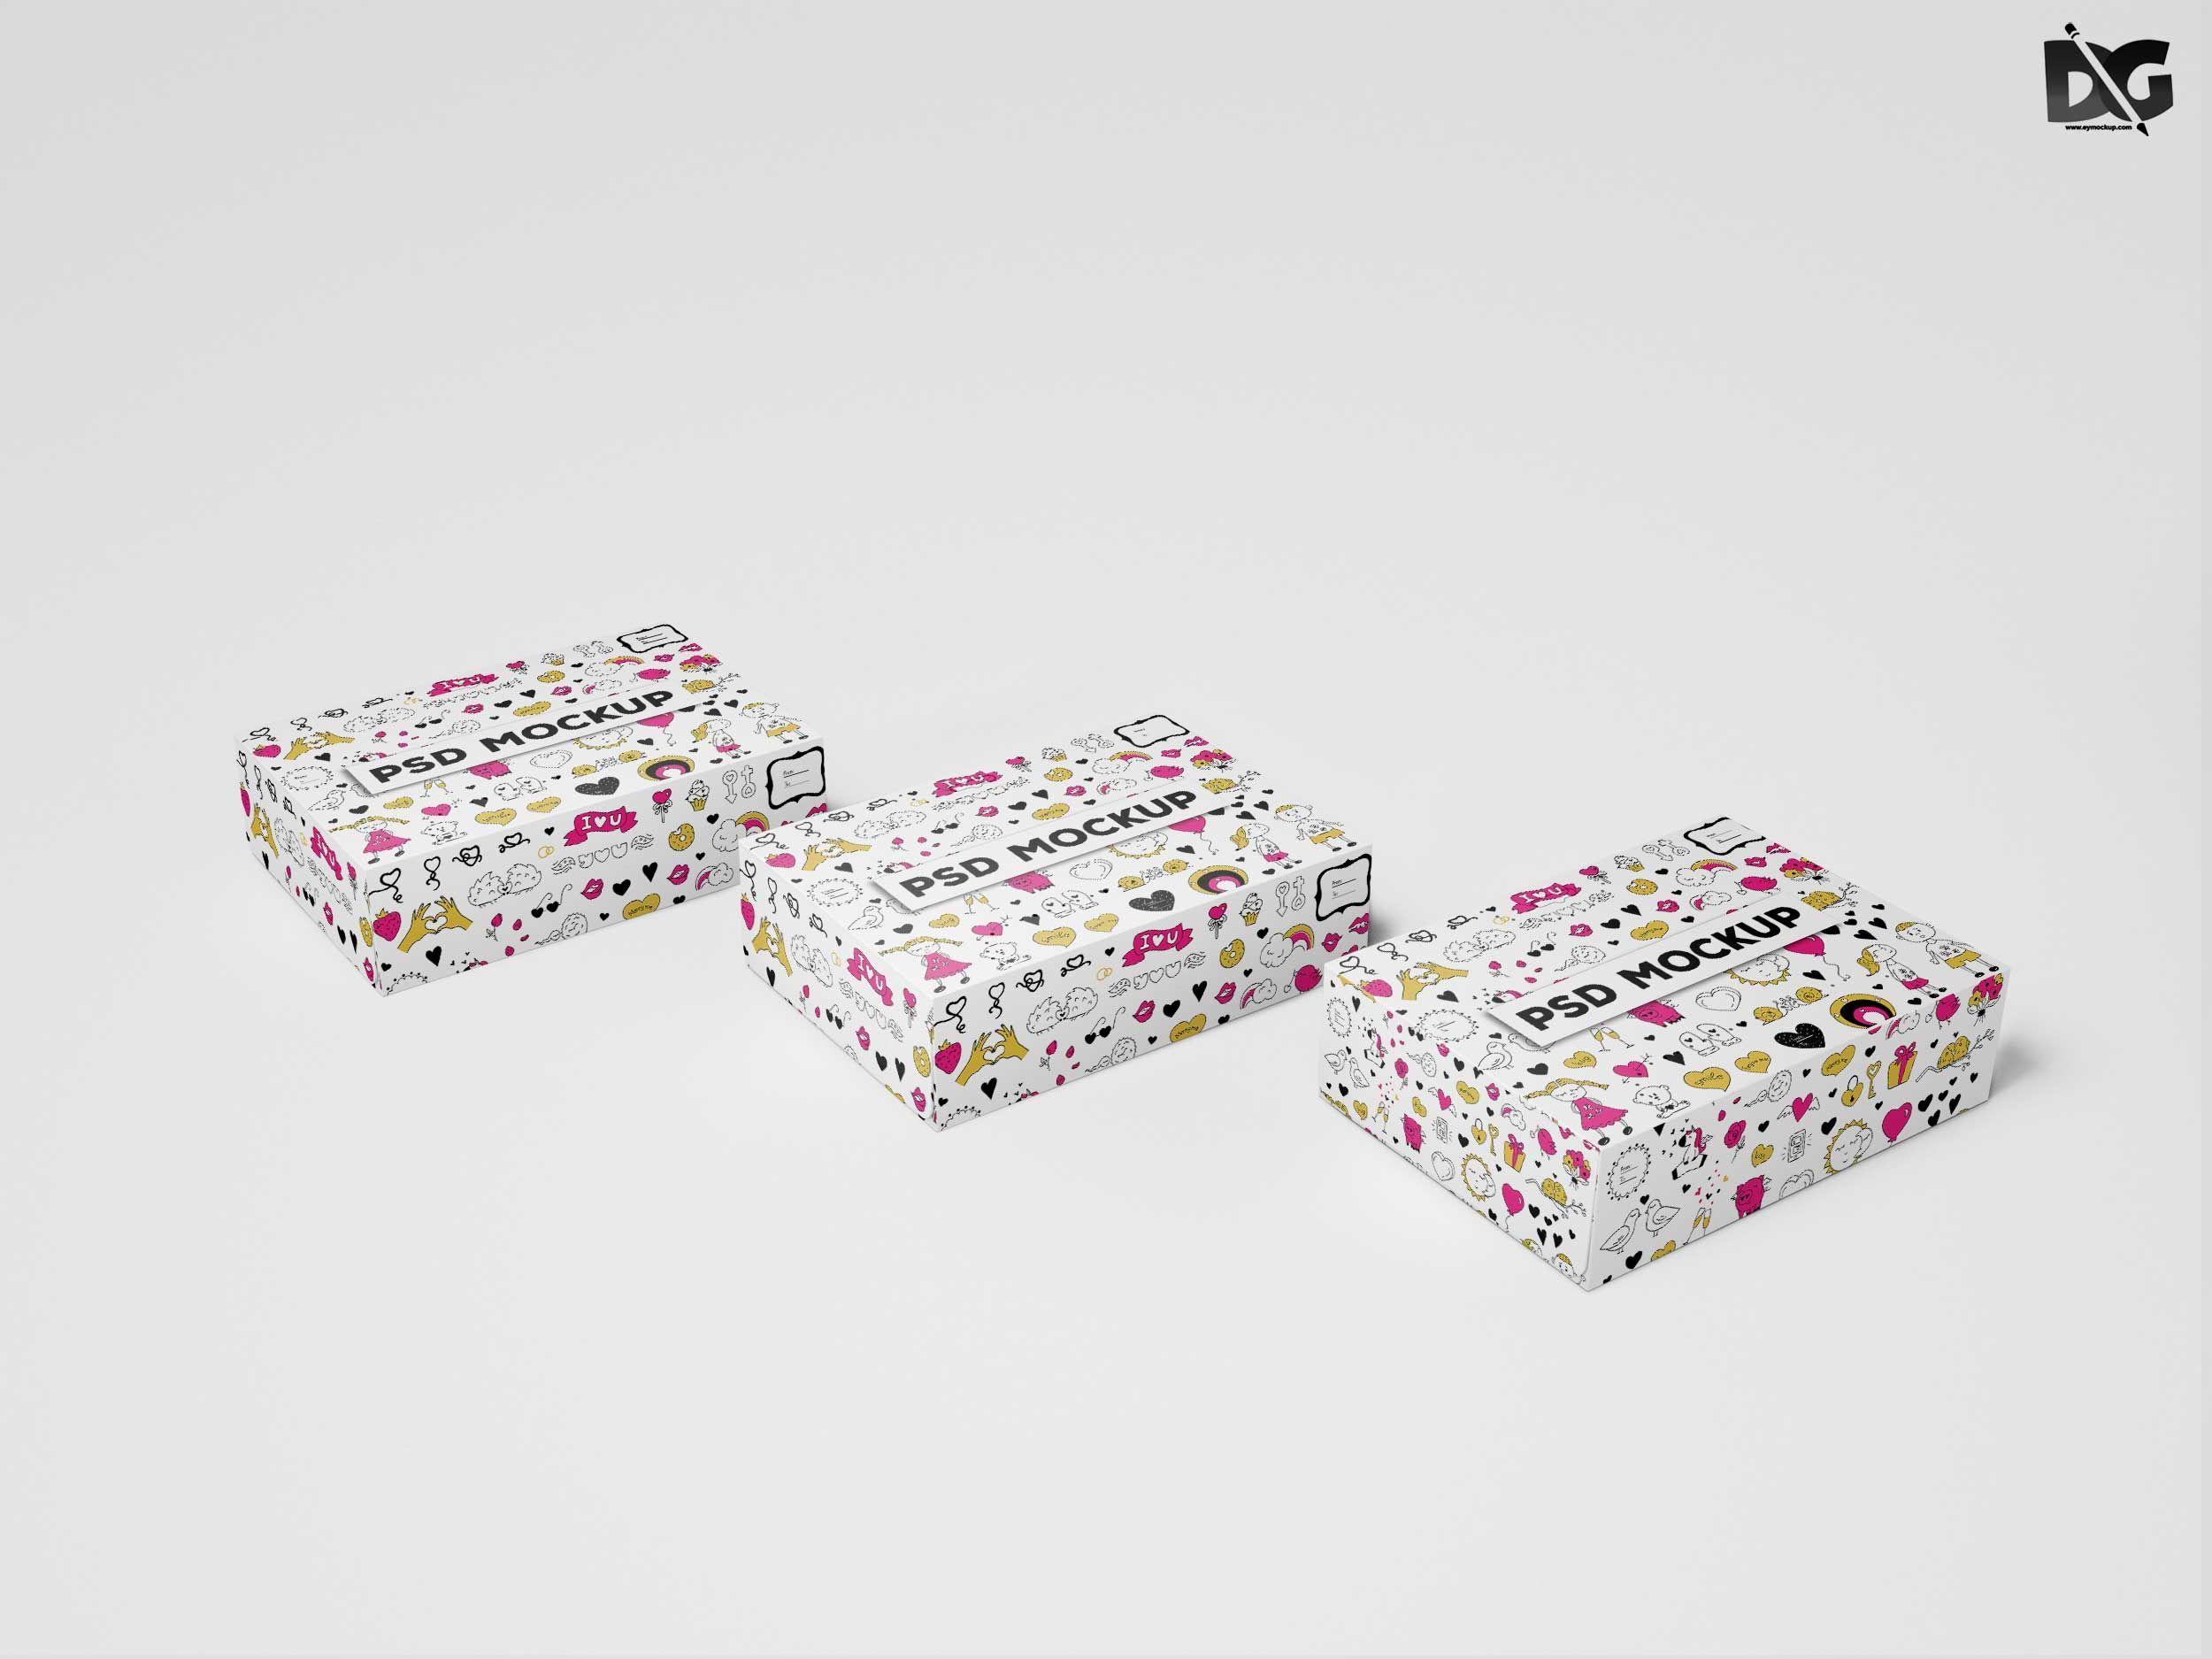 Download Free Napkins Psd Boxes Design Mockup Presentation Boxesmockup Branding Designmockup Download Download2018 Downl Box Mockup Mockup Free Psd Mockup Design